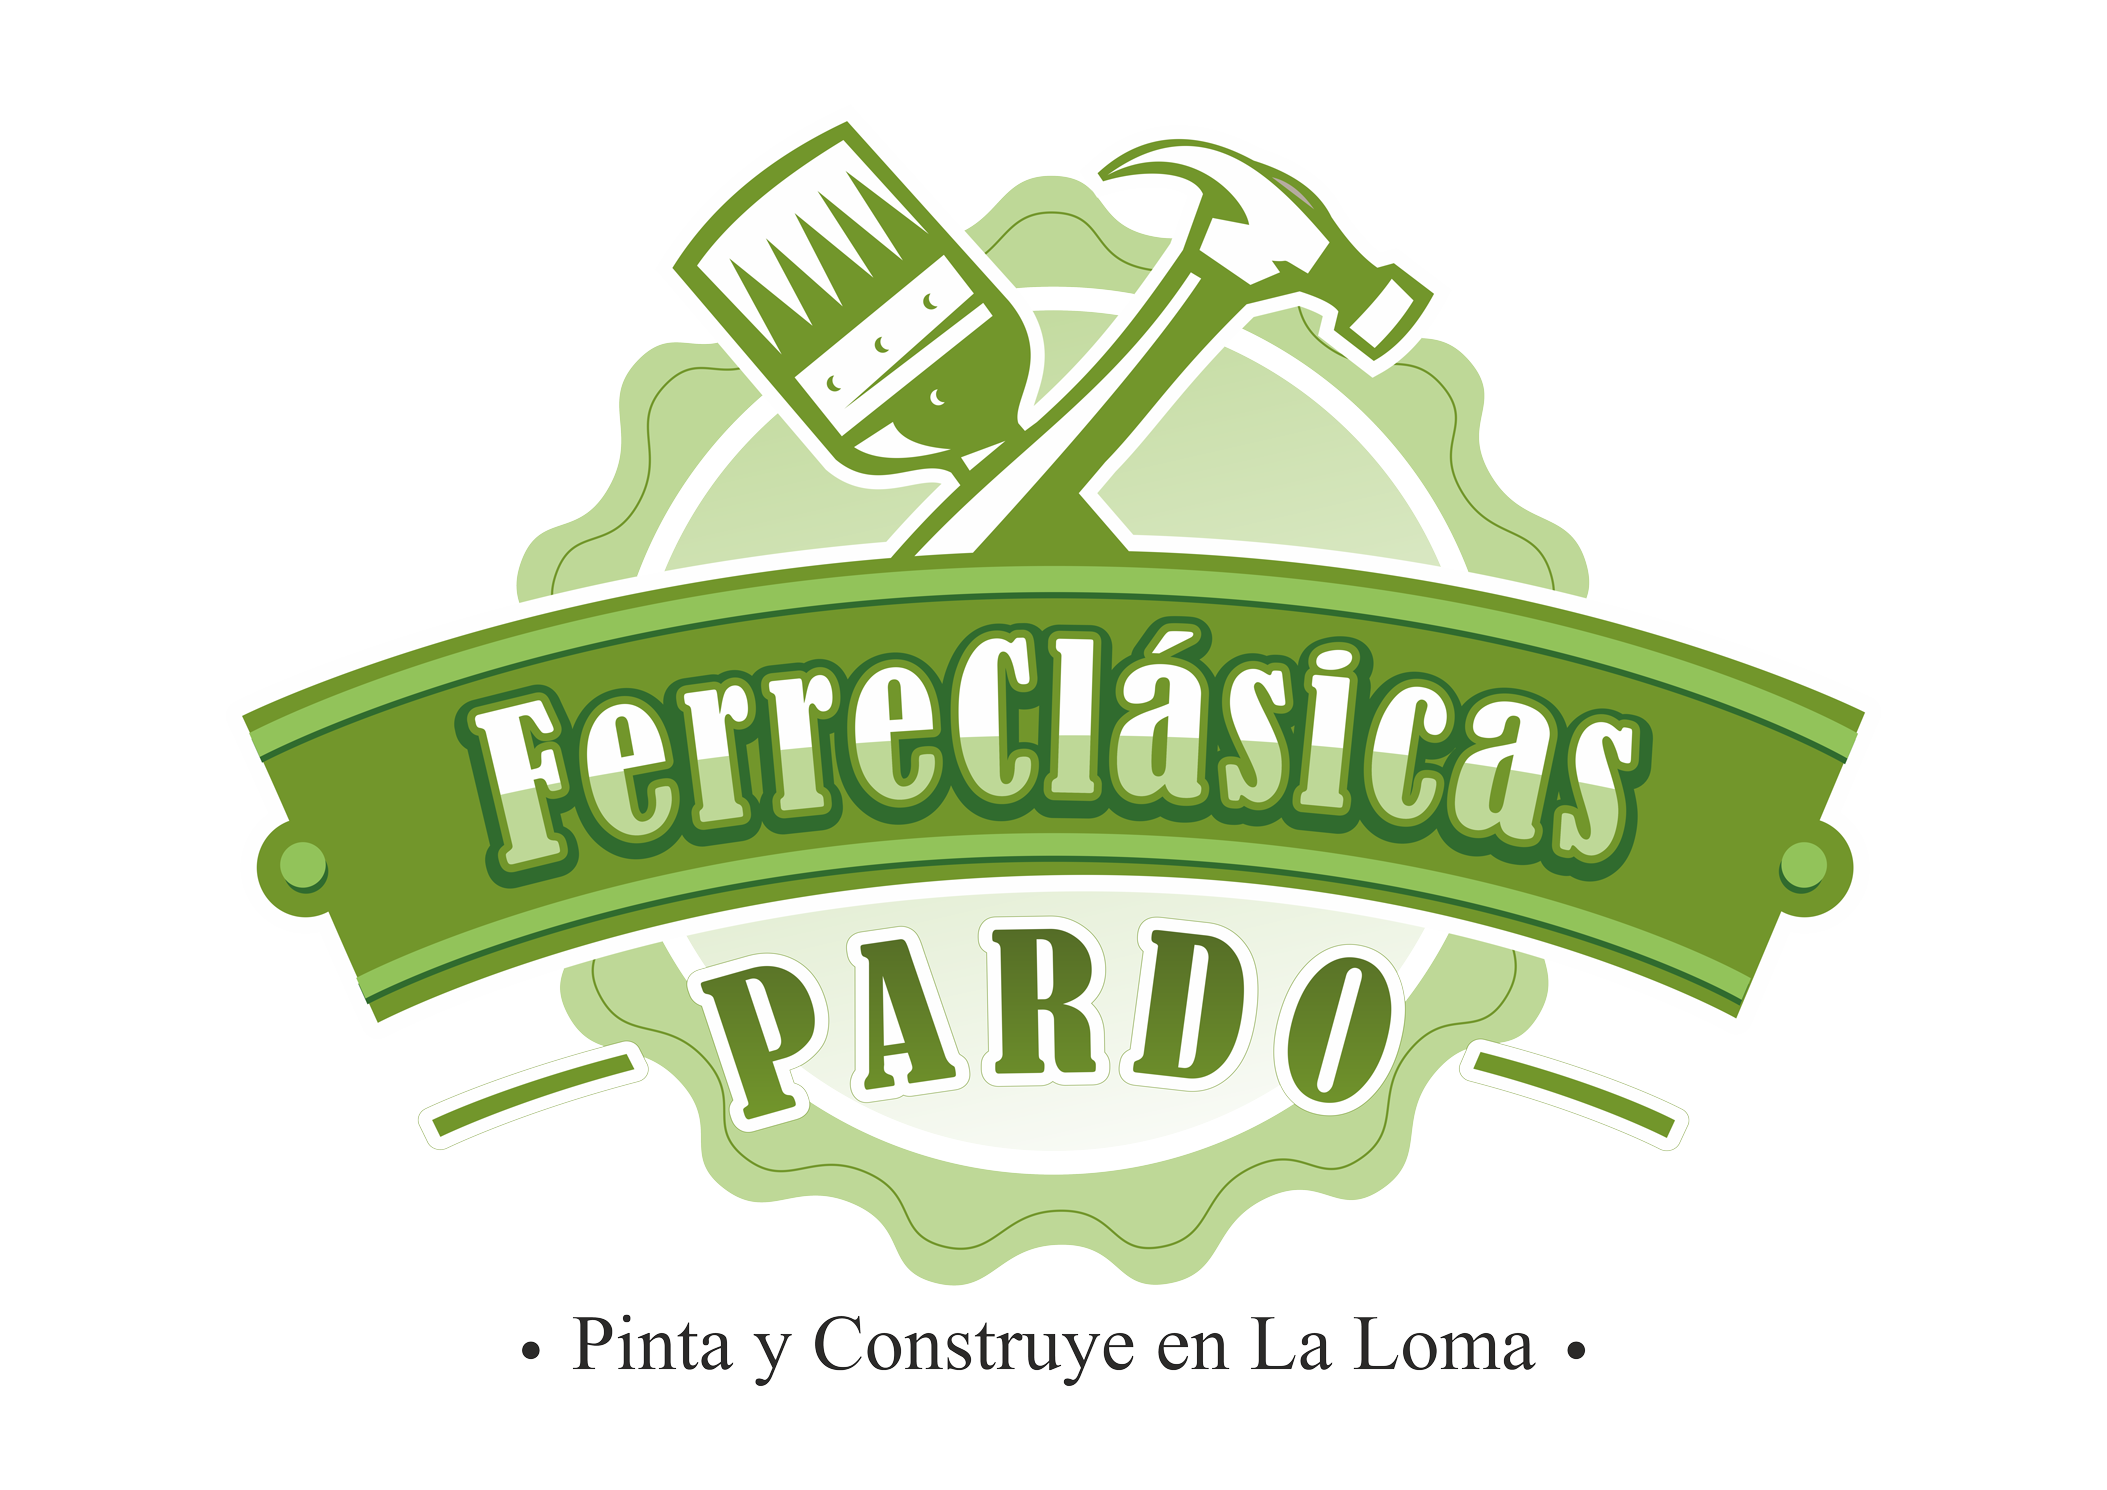 FERRECLASICAS-PARDO | COLOMBIA